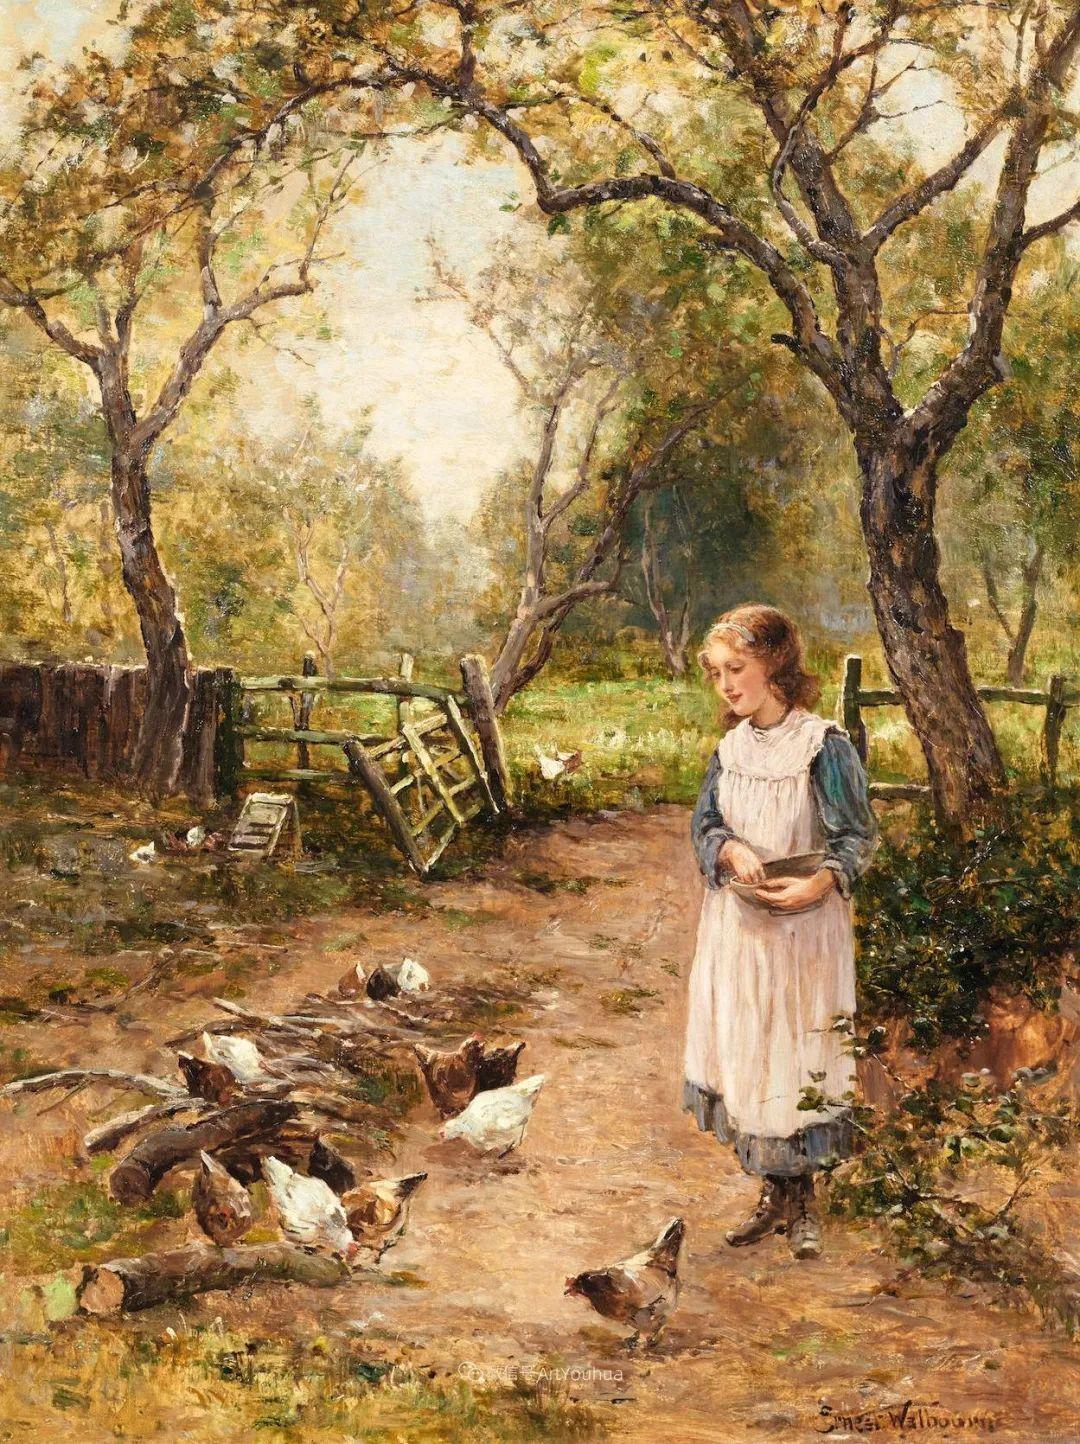 美丽村姑与诗意田园,英国画家Ernest Charles Walbourn作品(下)插图71